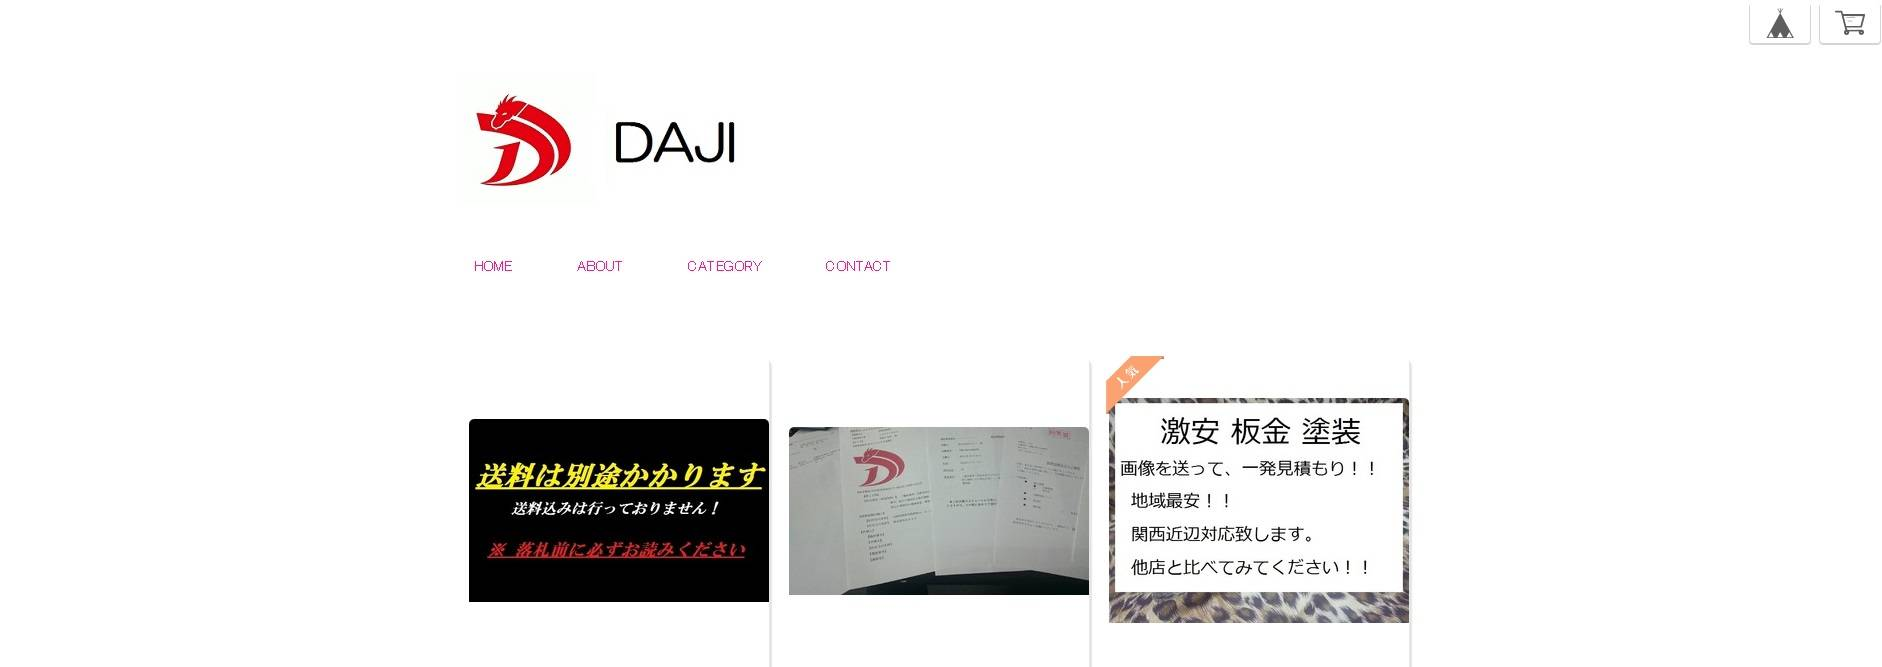 DAJI(ダージ)